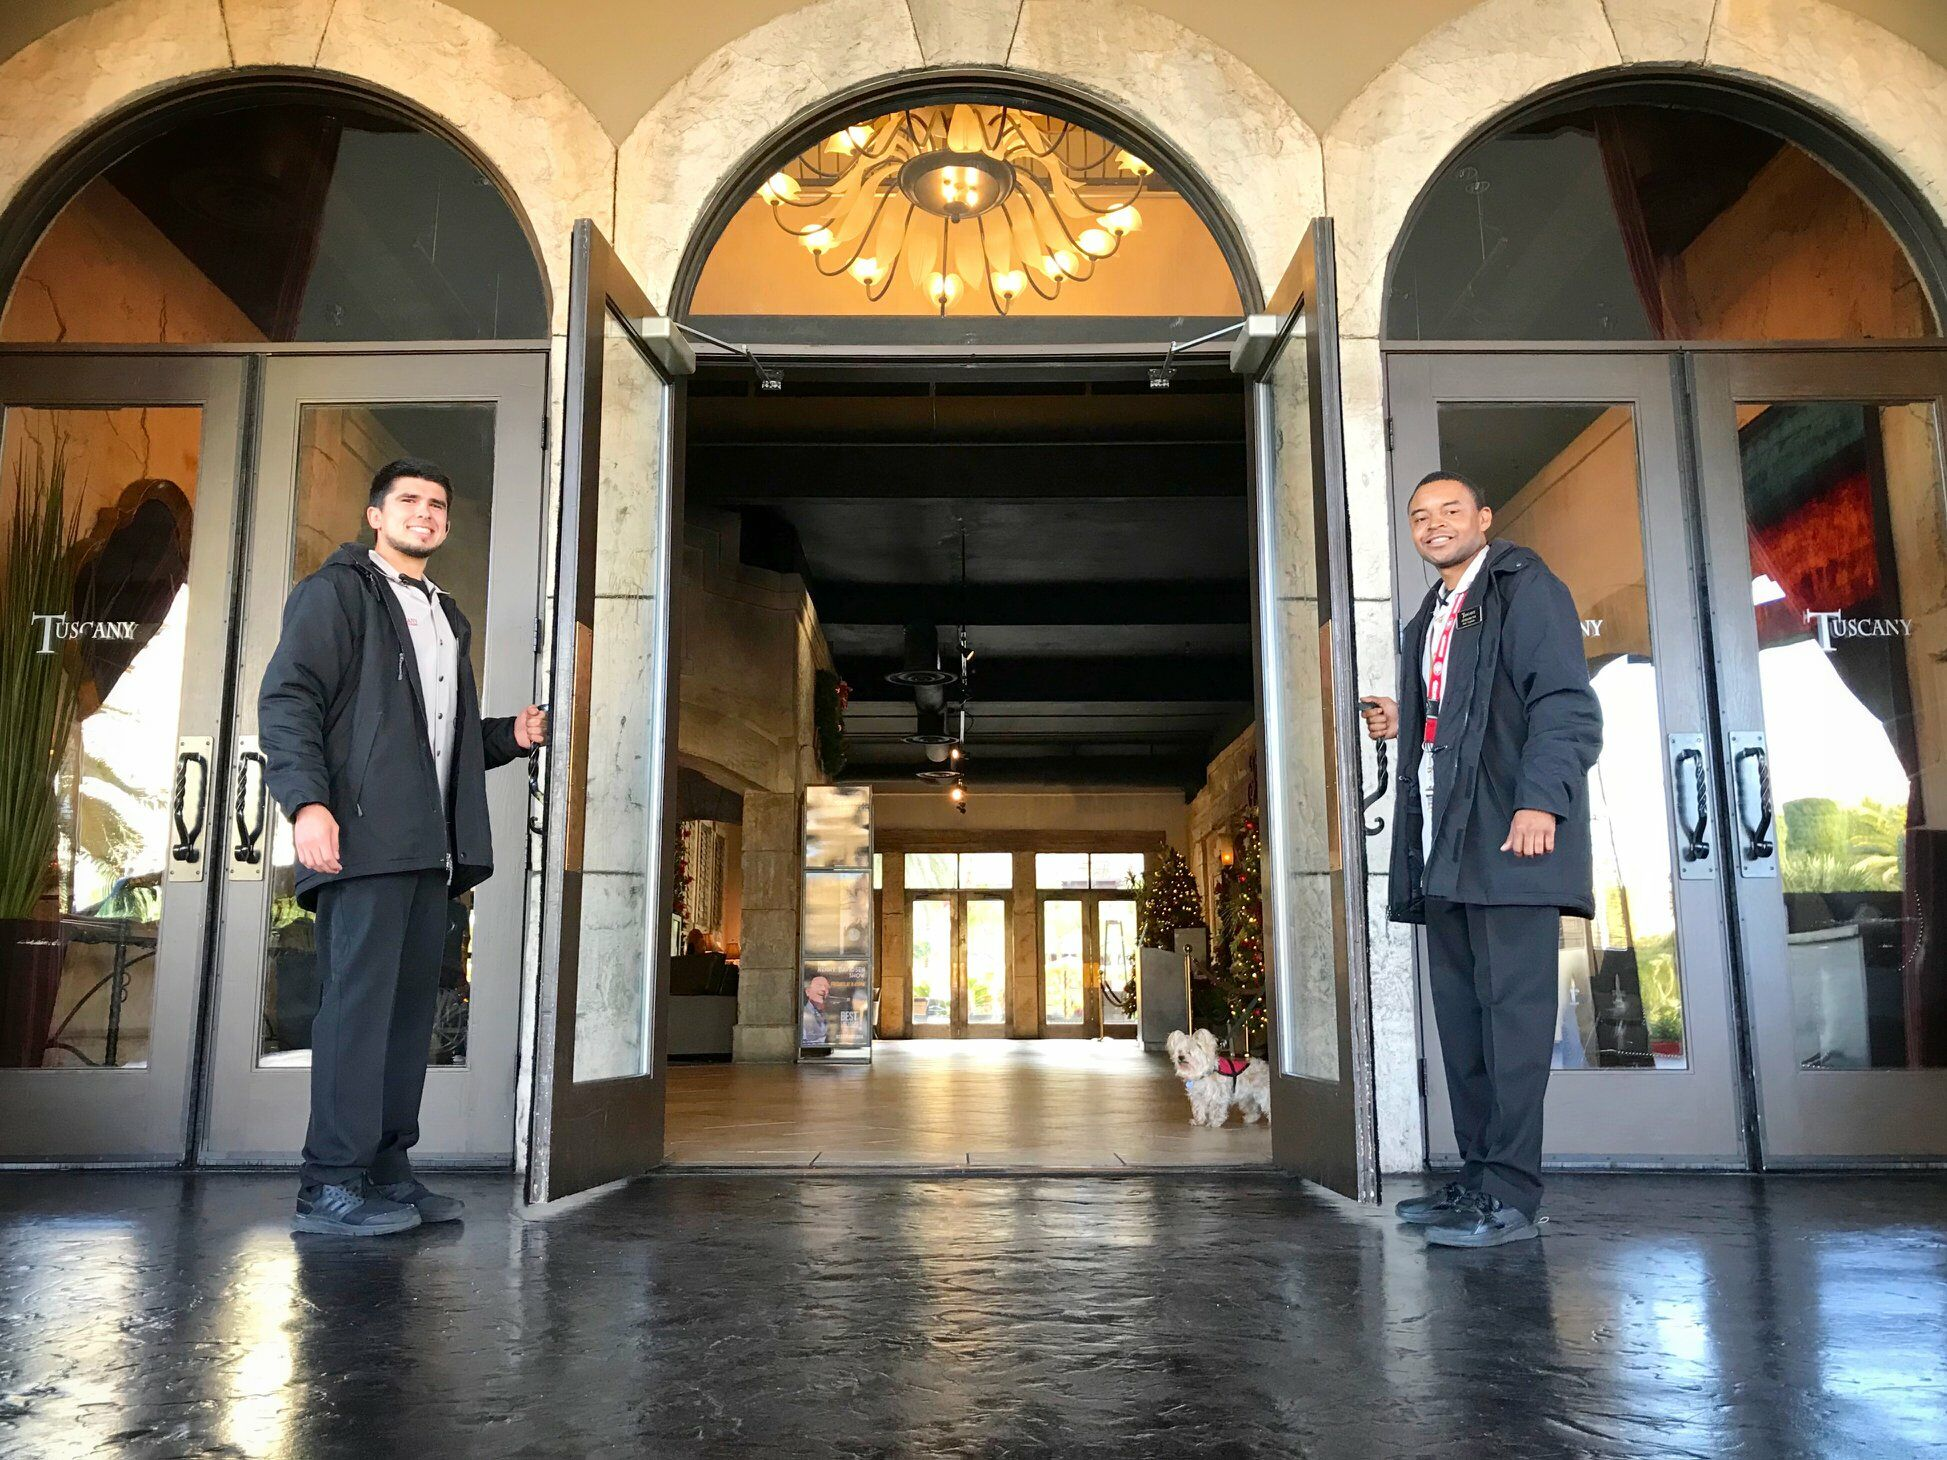 Tuscany Suites & Casino   Reception Venues - Las Vegas, NV